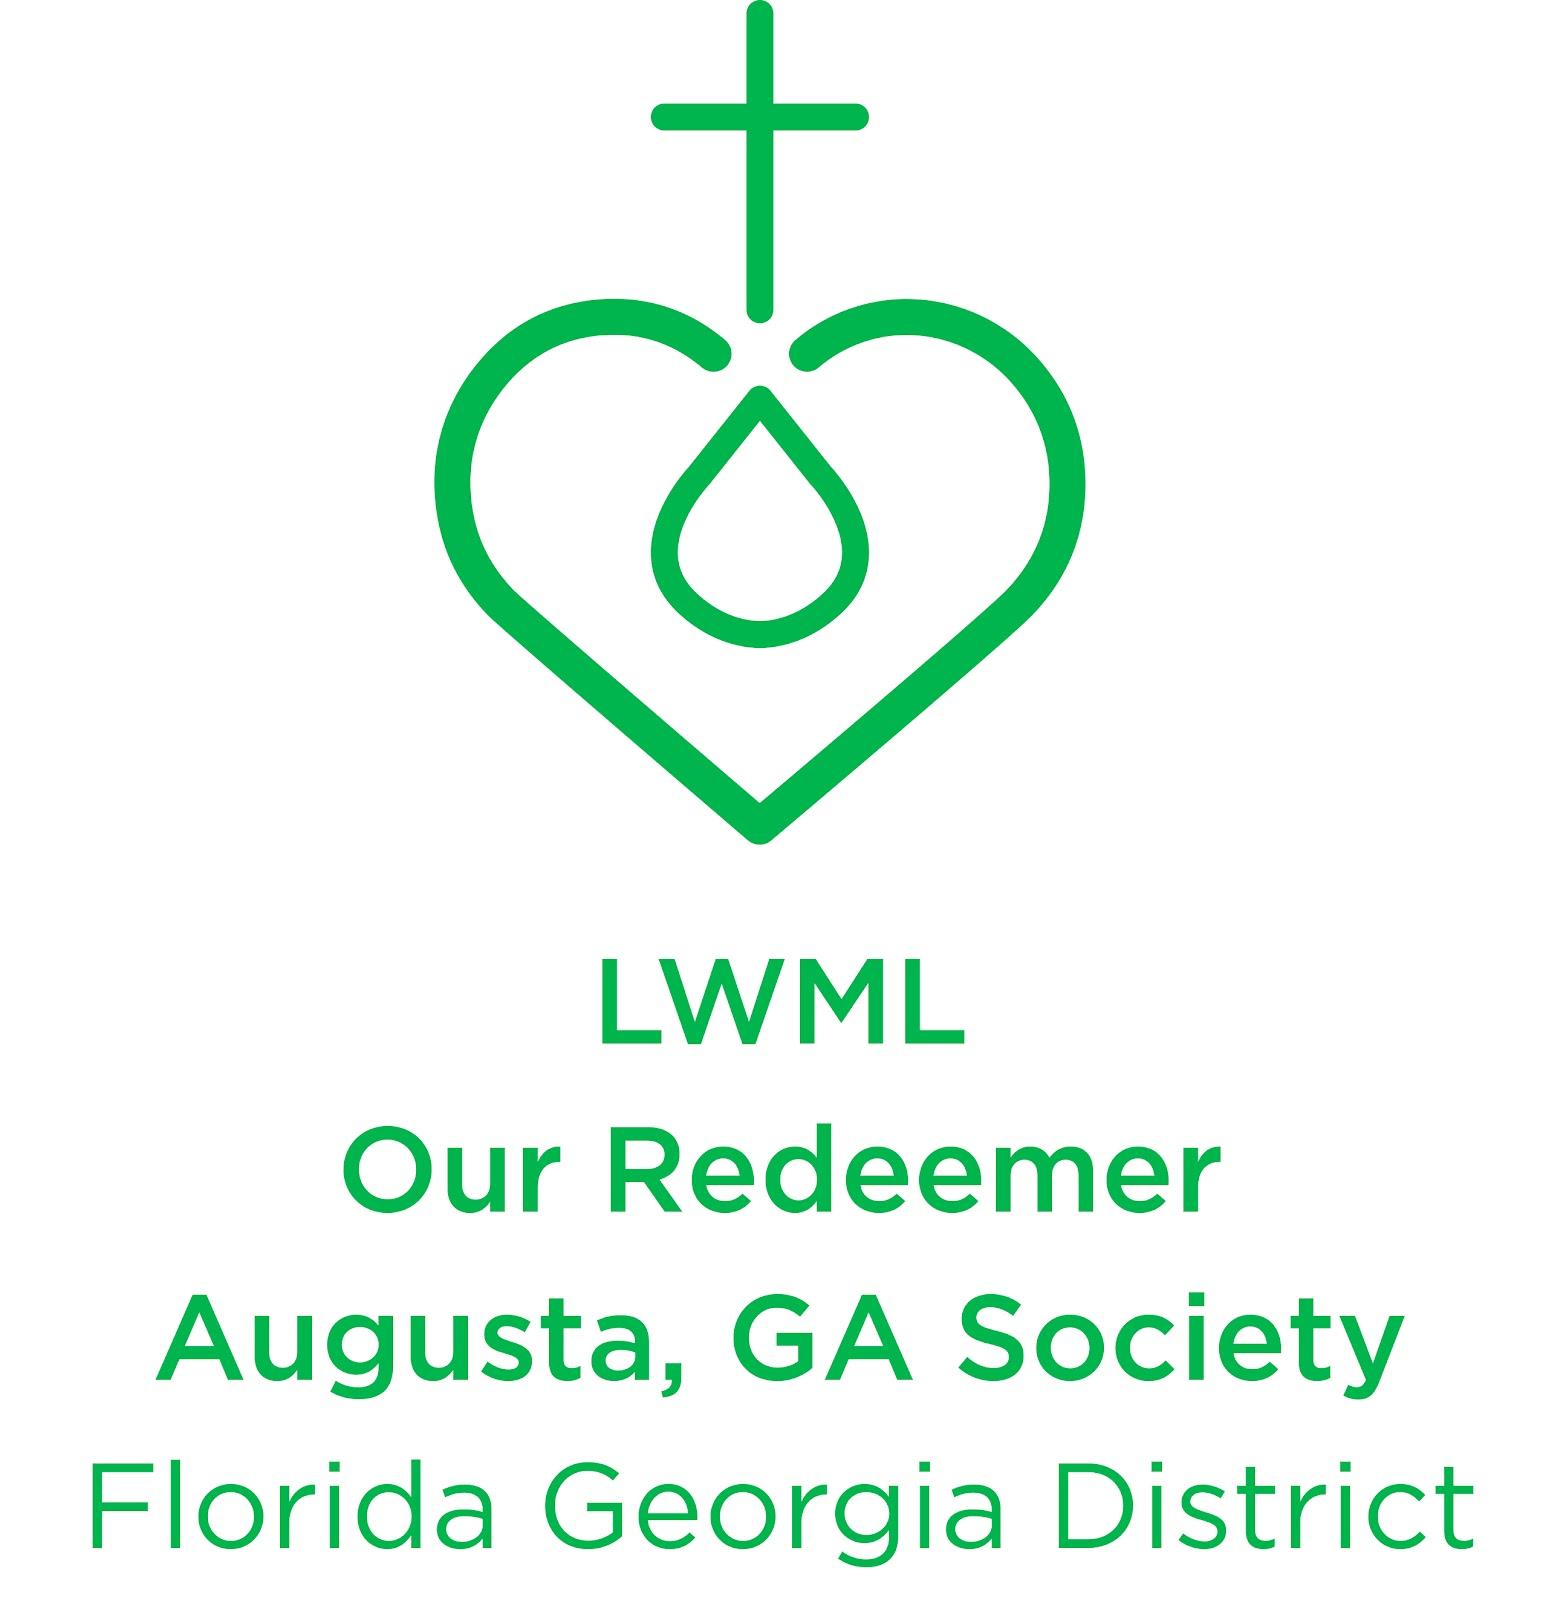 LWML_Our Redeemer August GA Society.jpg